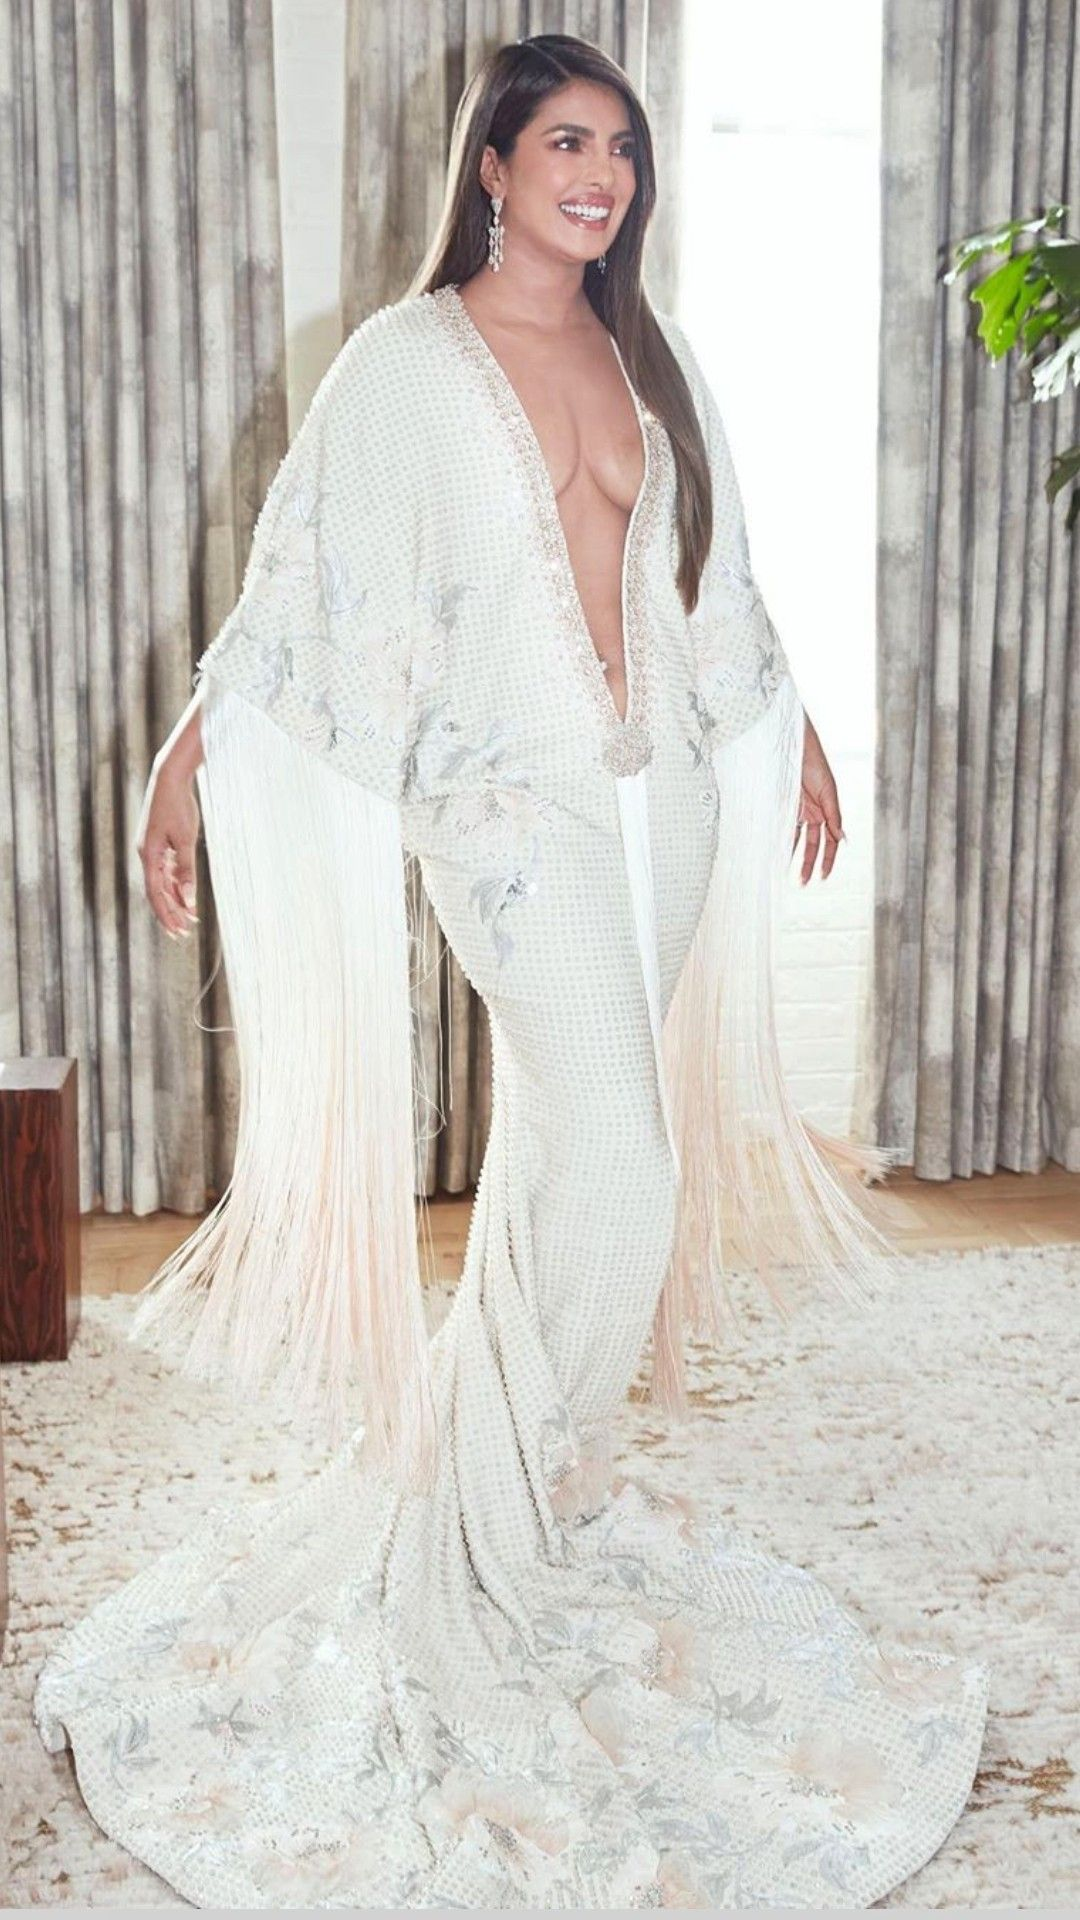 Priyanka Chopra at the 2020 Grammy Awards in 2020